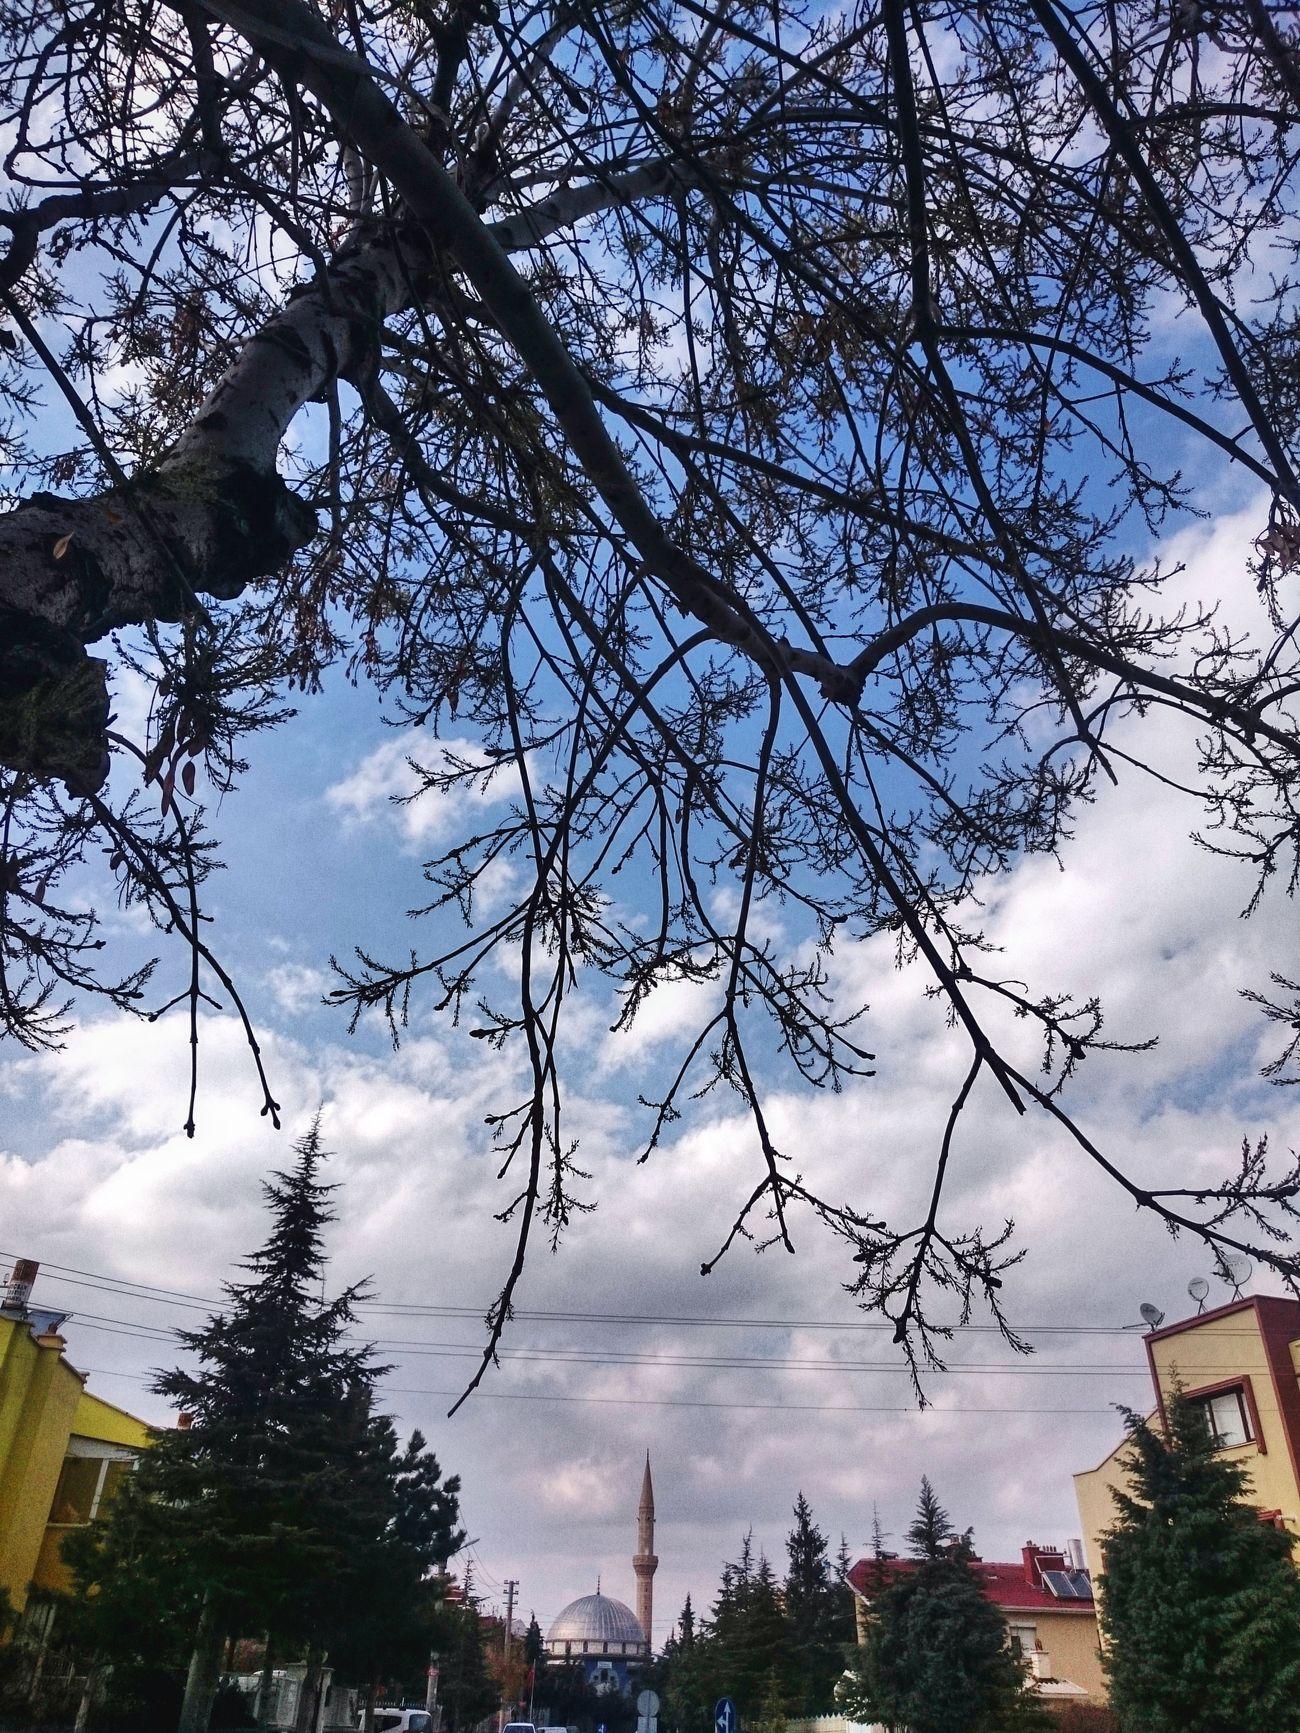 Tree Sky Nature Cloud - Sky City Skyscraper Day Konya Konyagram Konyainstagram Konya Turkey Sony Xperia Z3 Compact Sun ☀ Bahar